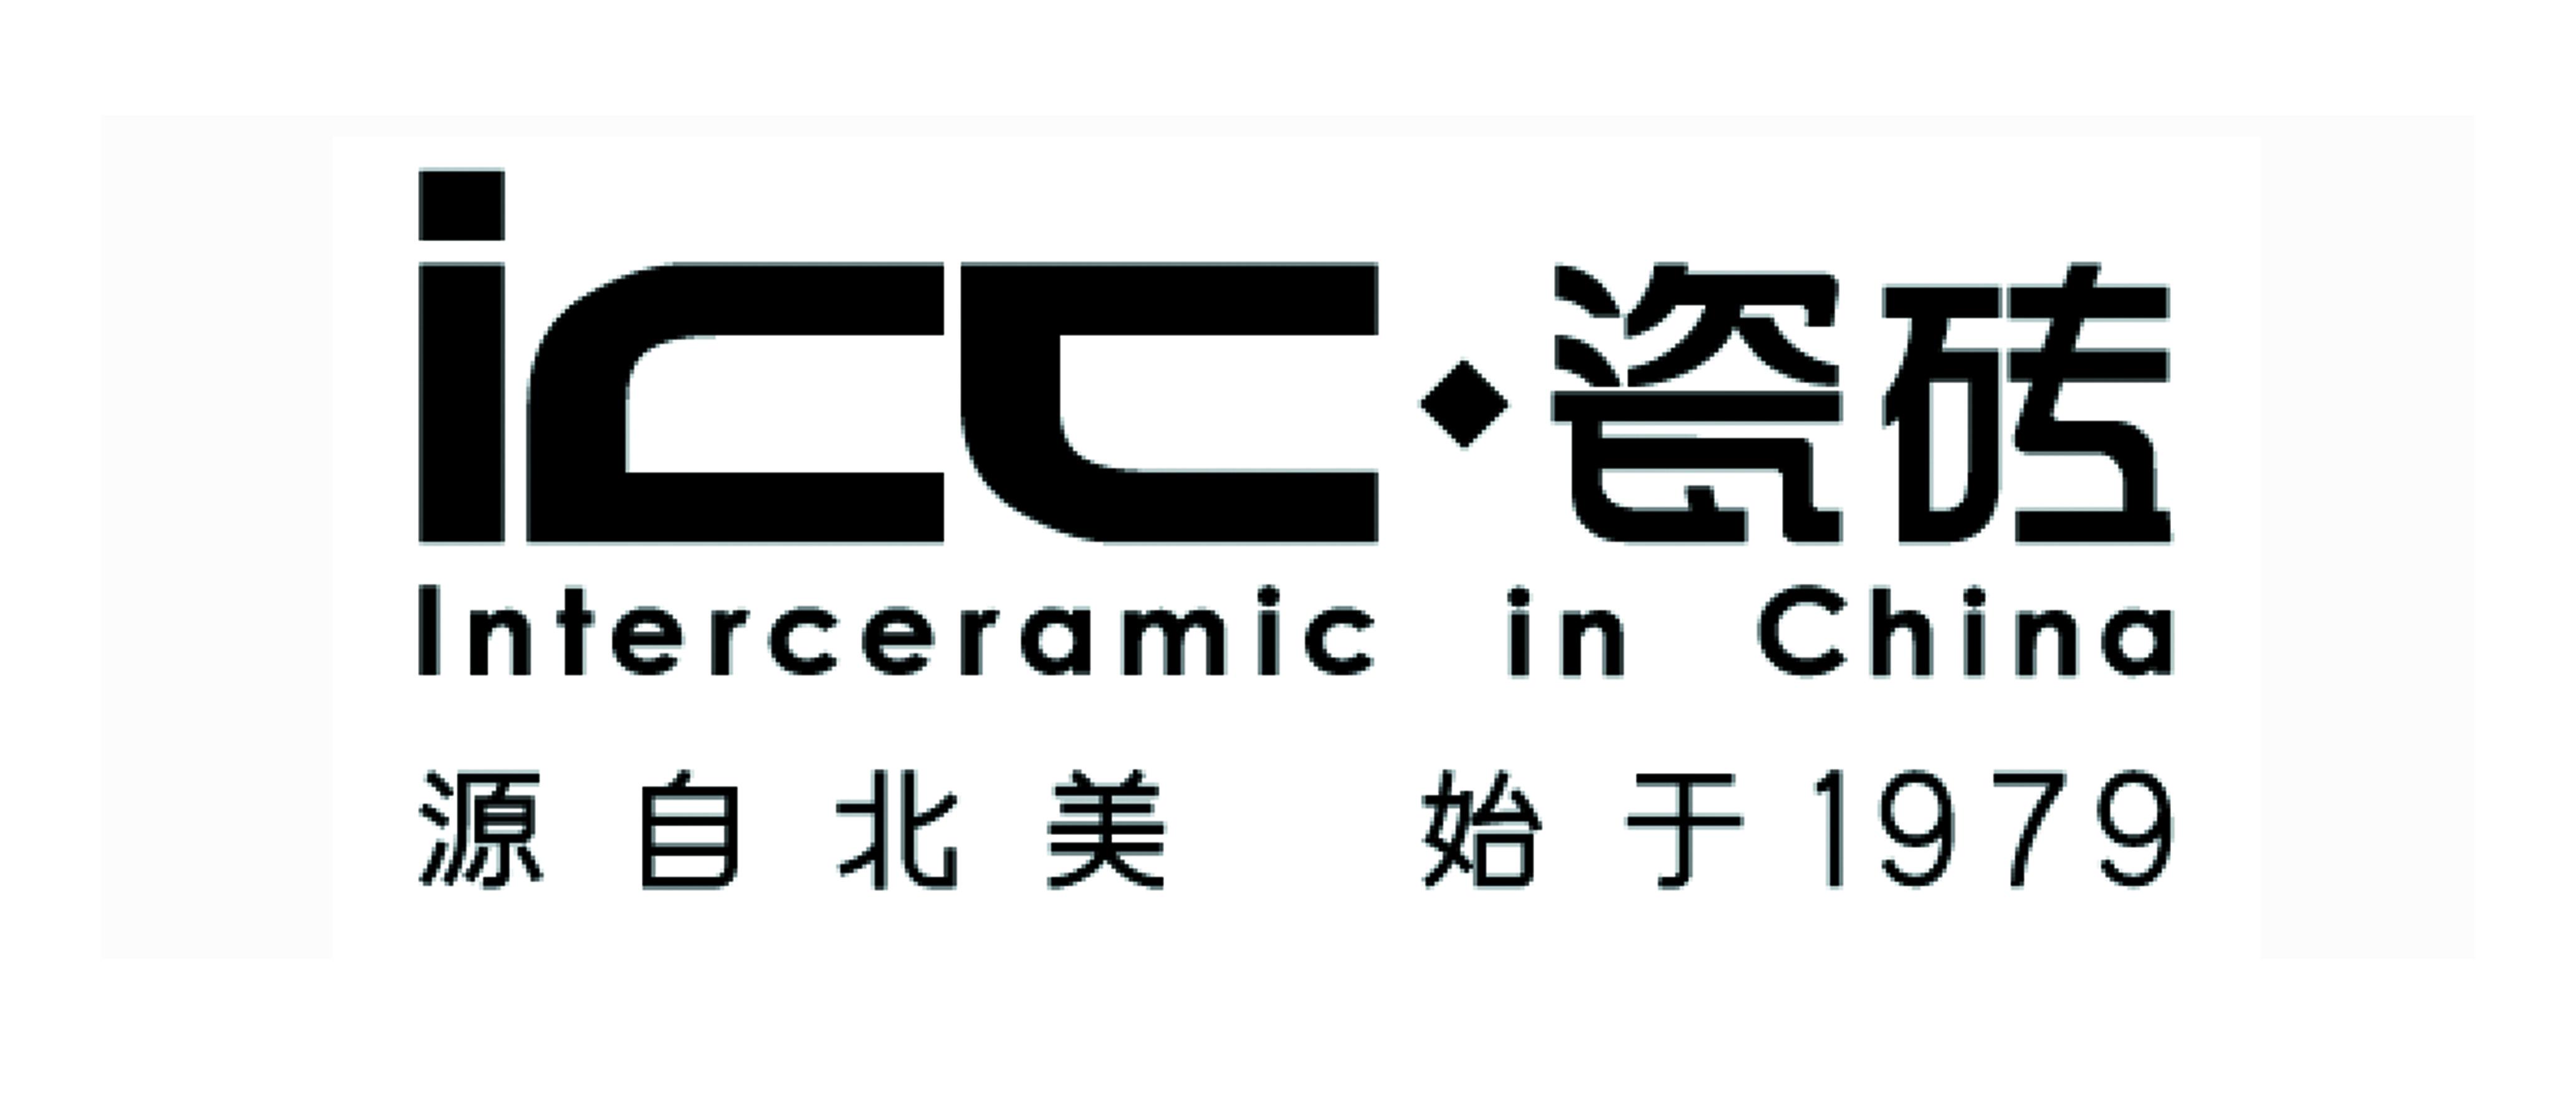 ICC瓷砖